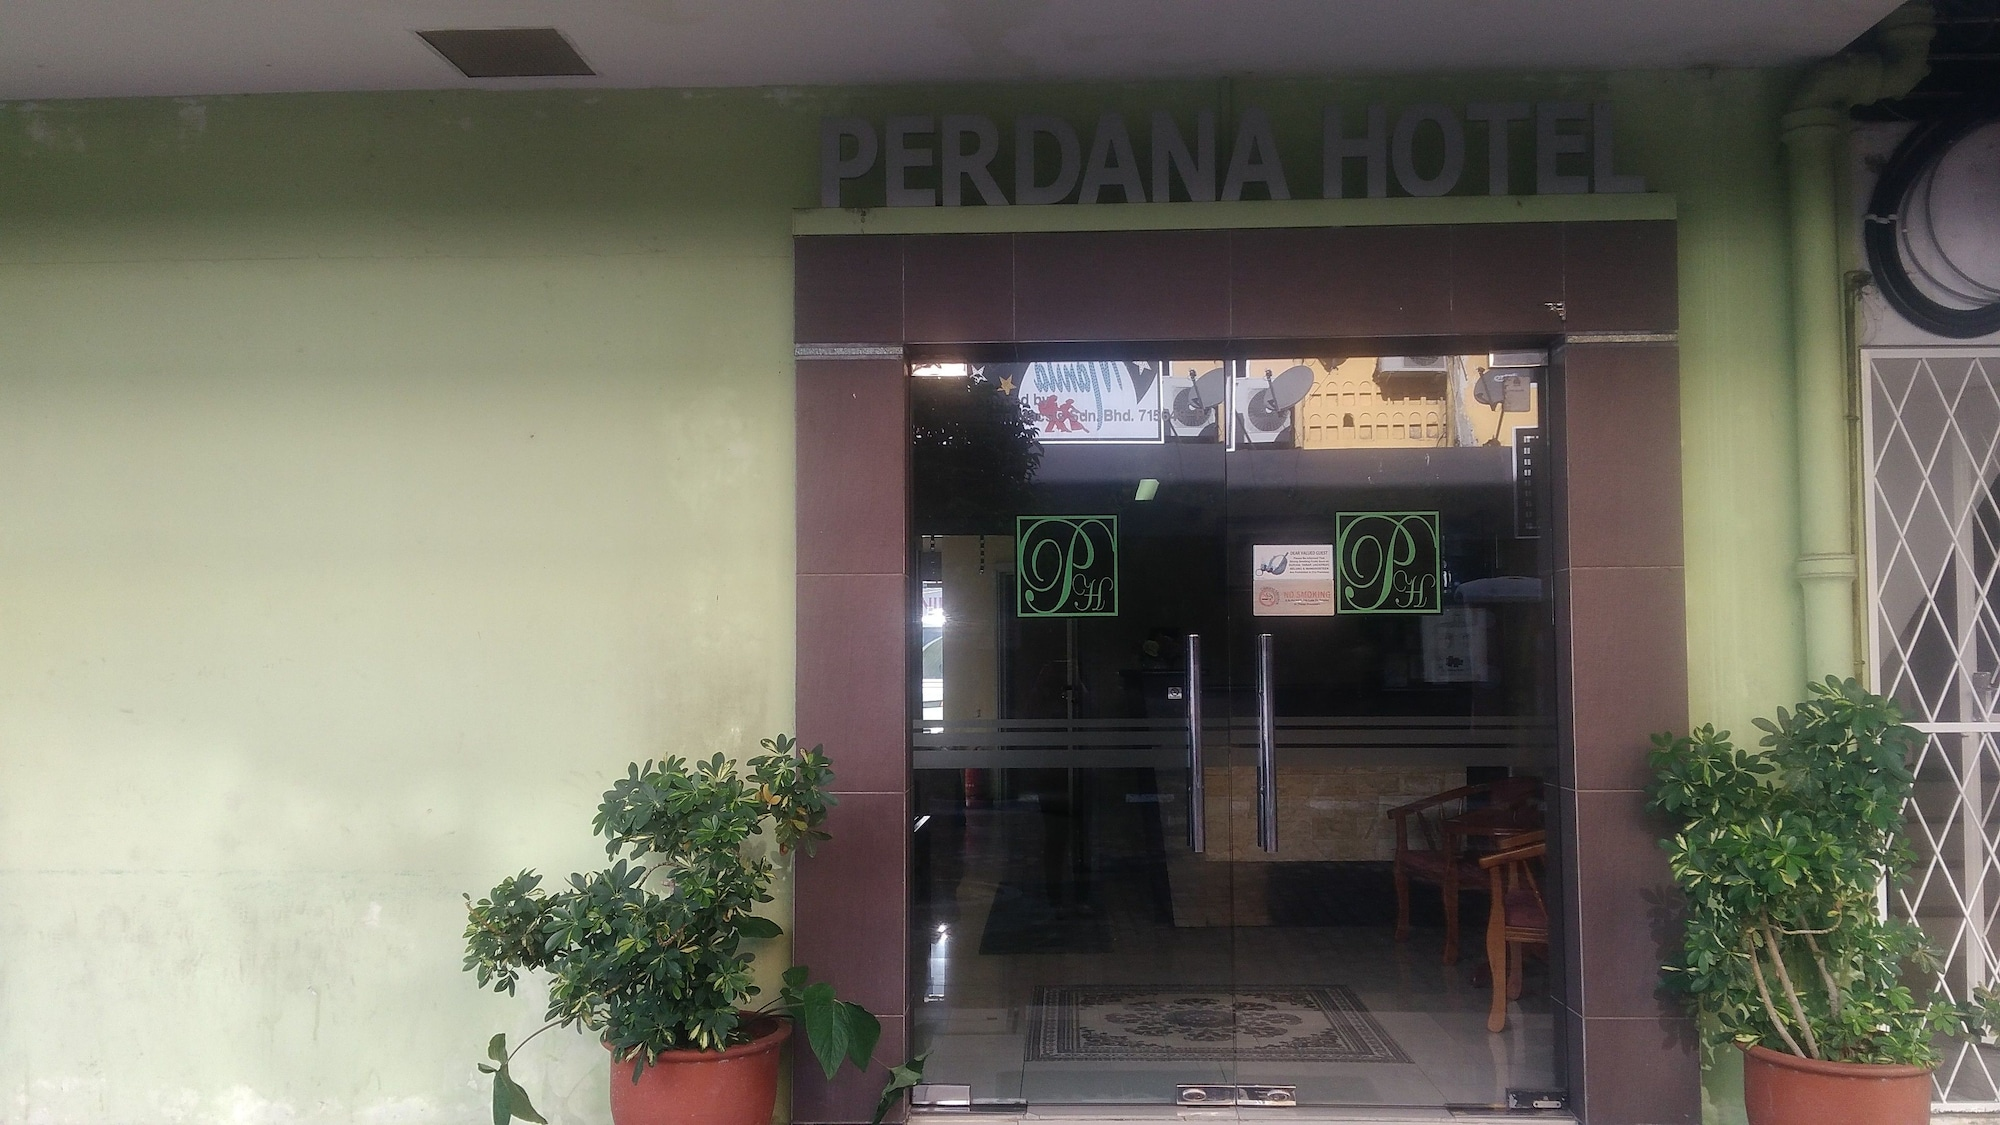 Perdana Hotel, Labuan